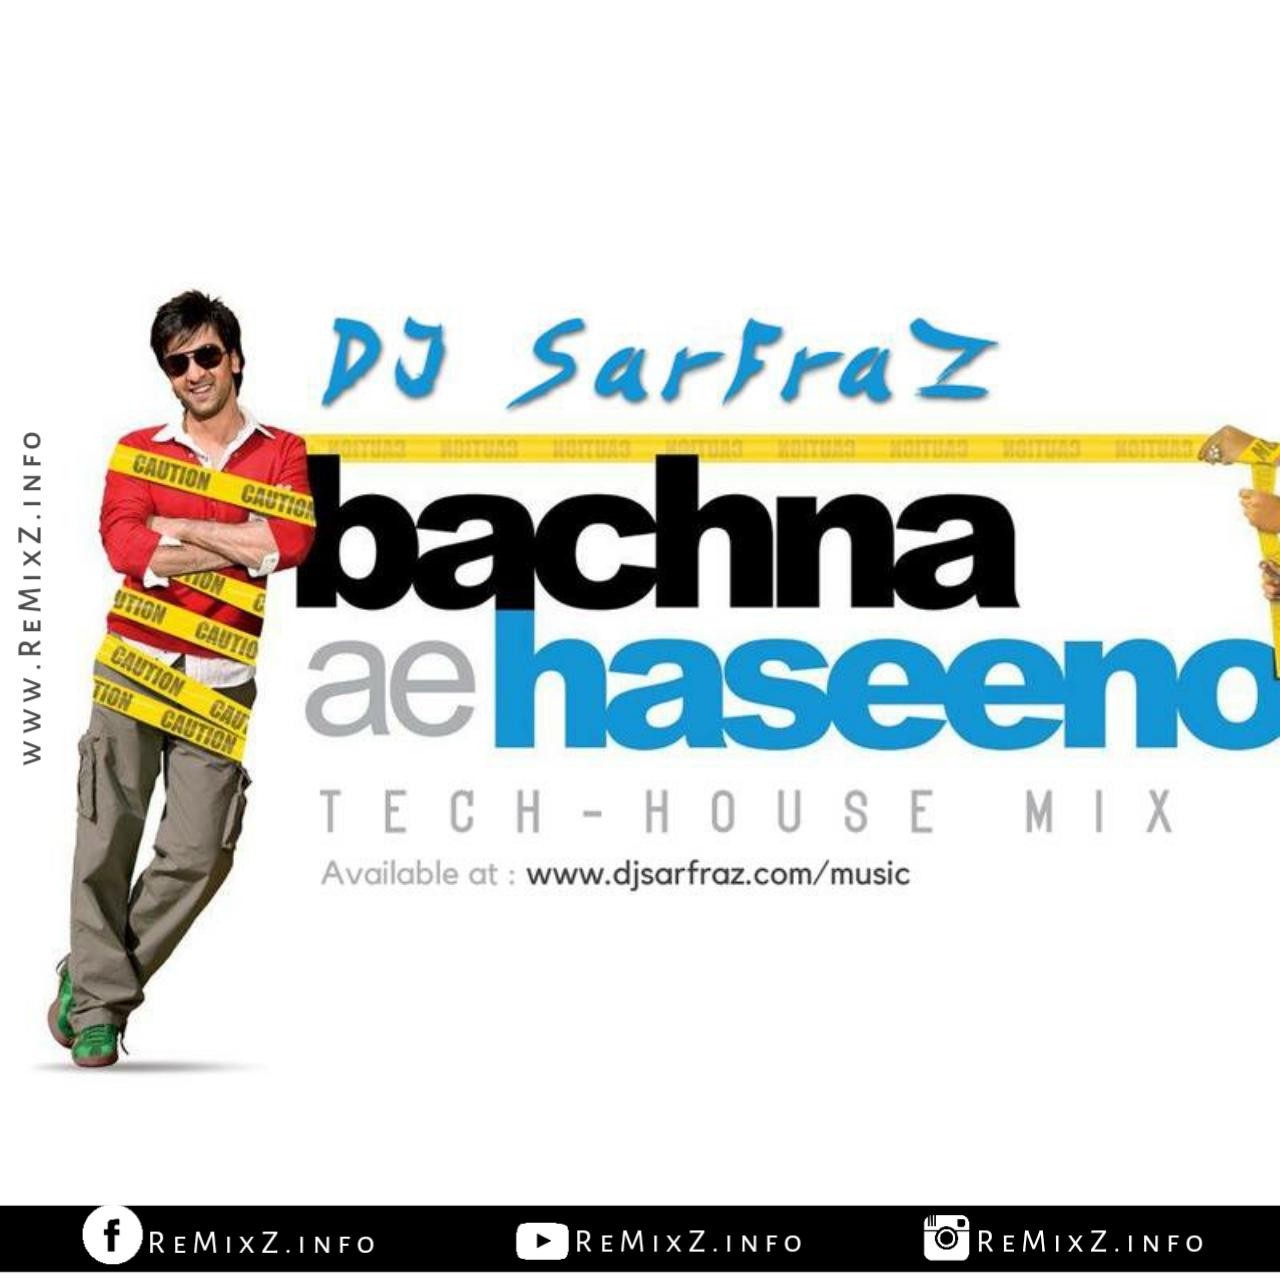 bachna-ae-haseeno-tech-house-mix-dj-sarfraz.jpg